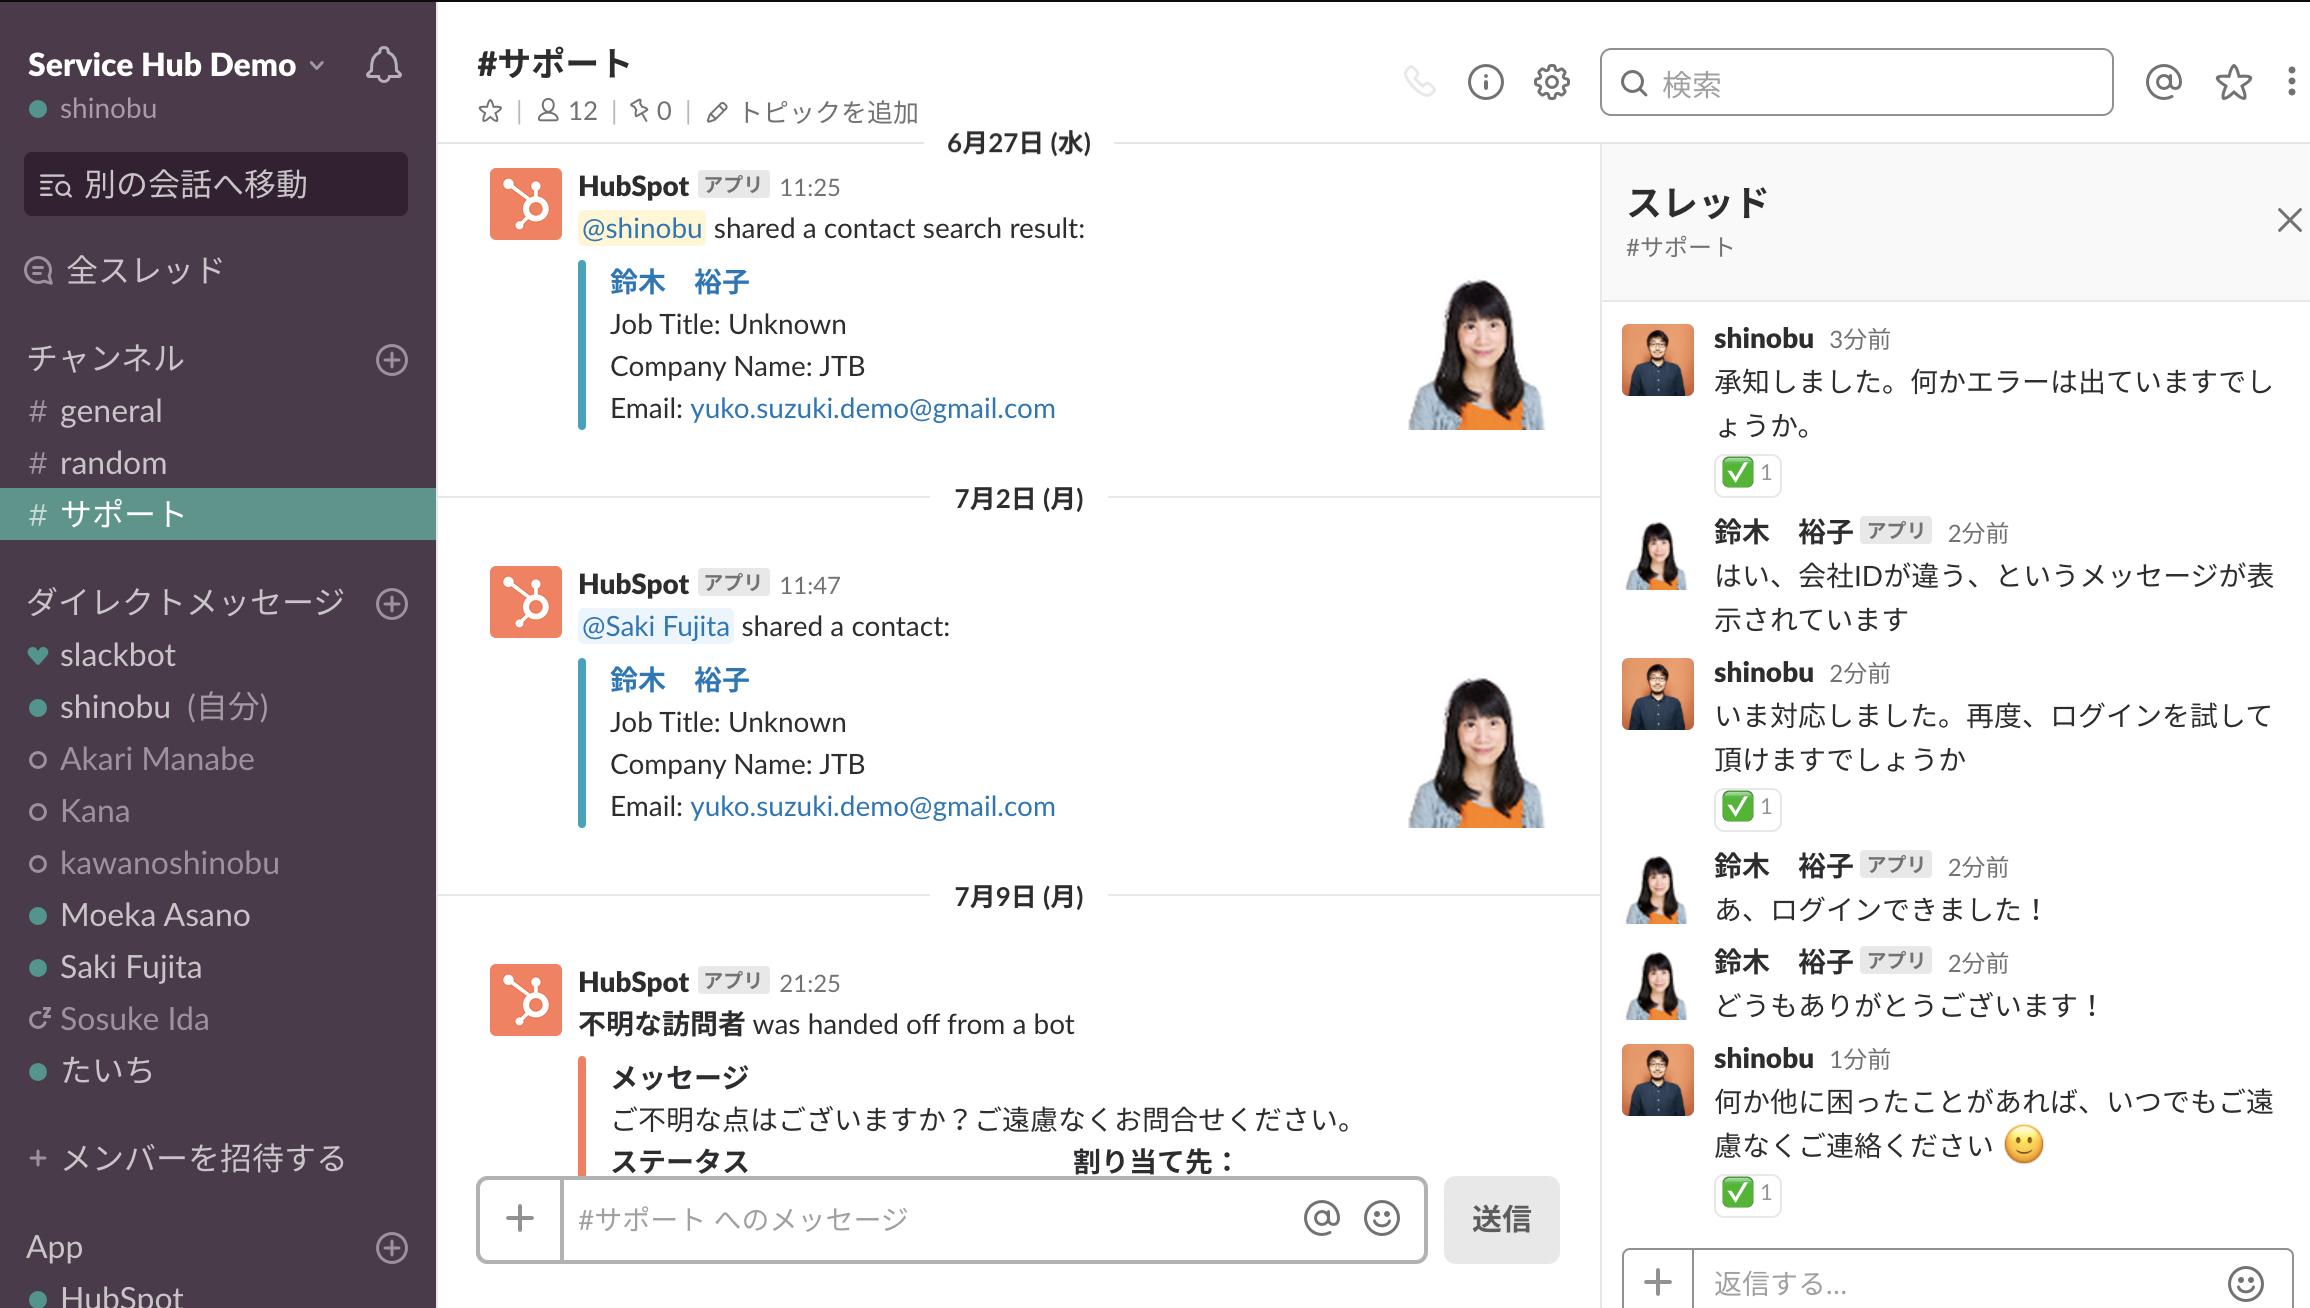 CRM-contact-management-4.png